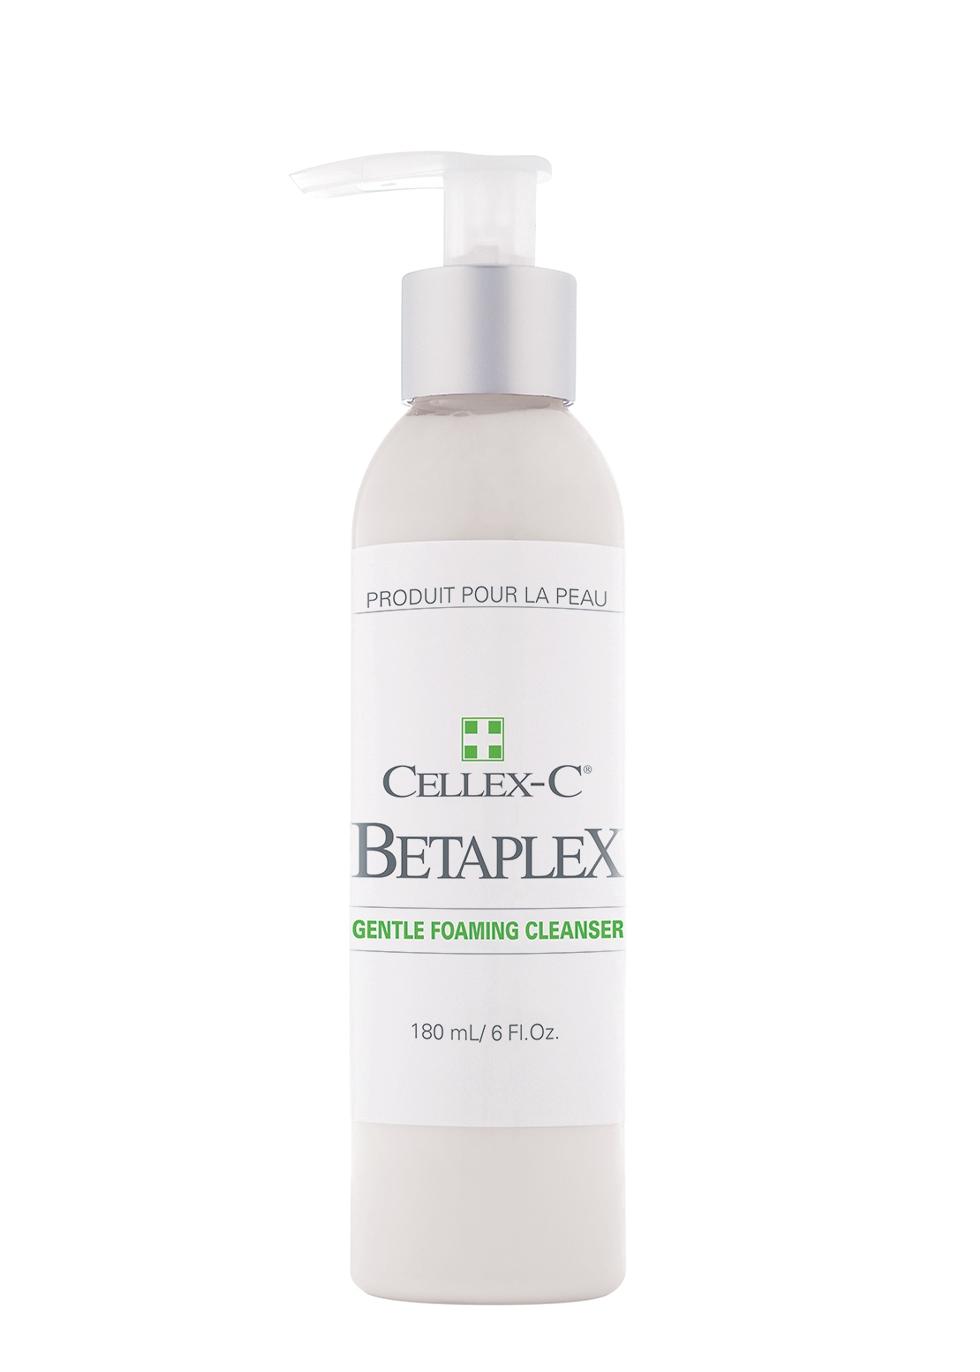 Betaplex Gentle Foaming Cleanser 180ml